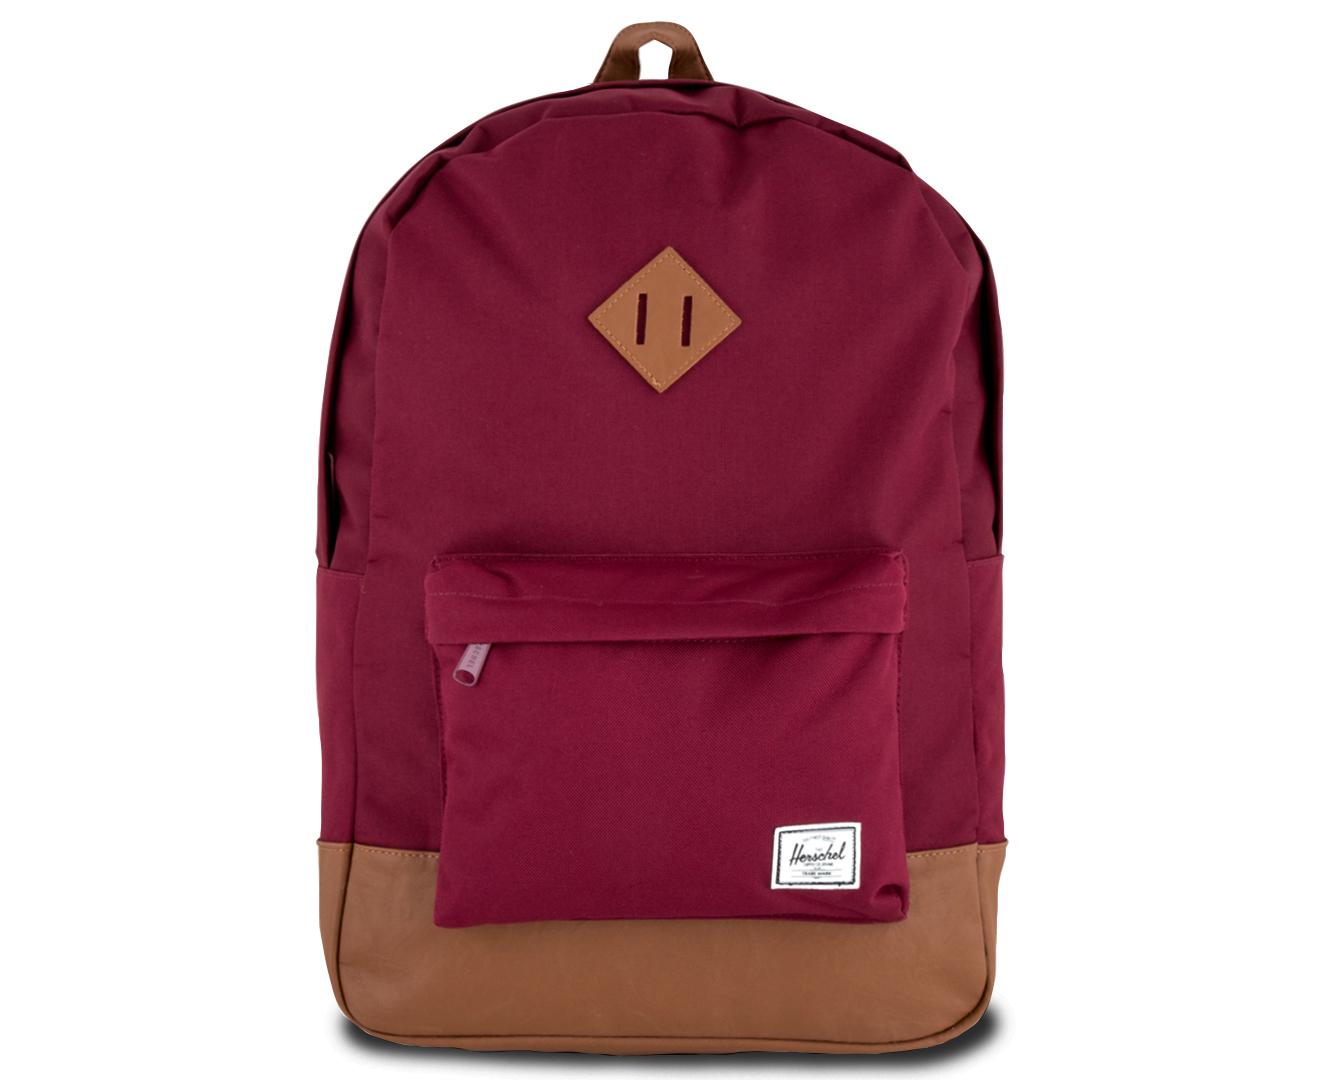 8016e36d0c Herschel Supply Co. 21.5L Heritage Backpack - Windsor Wine Tan ...